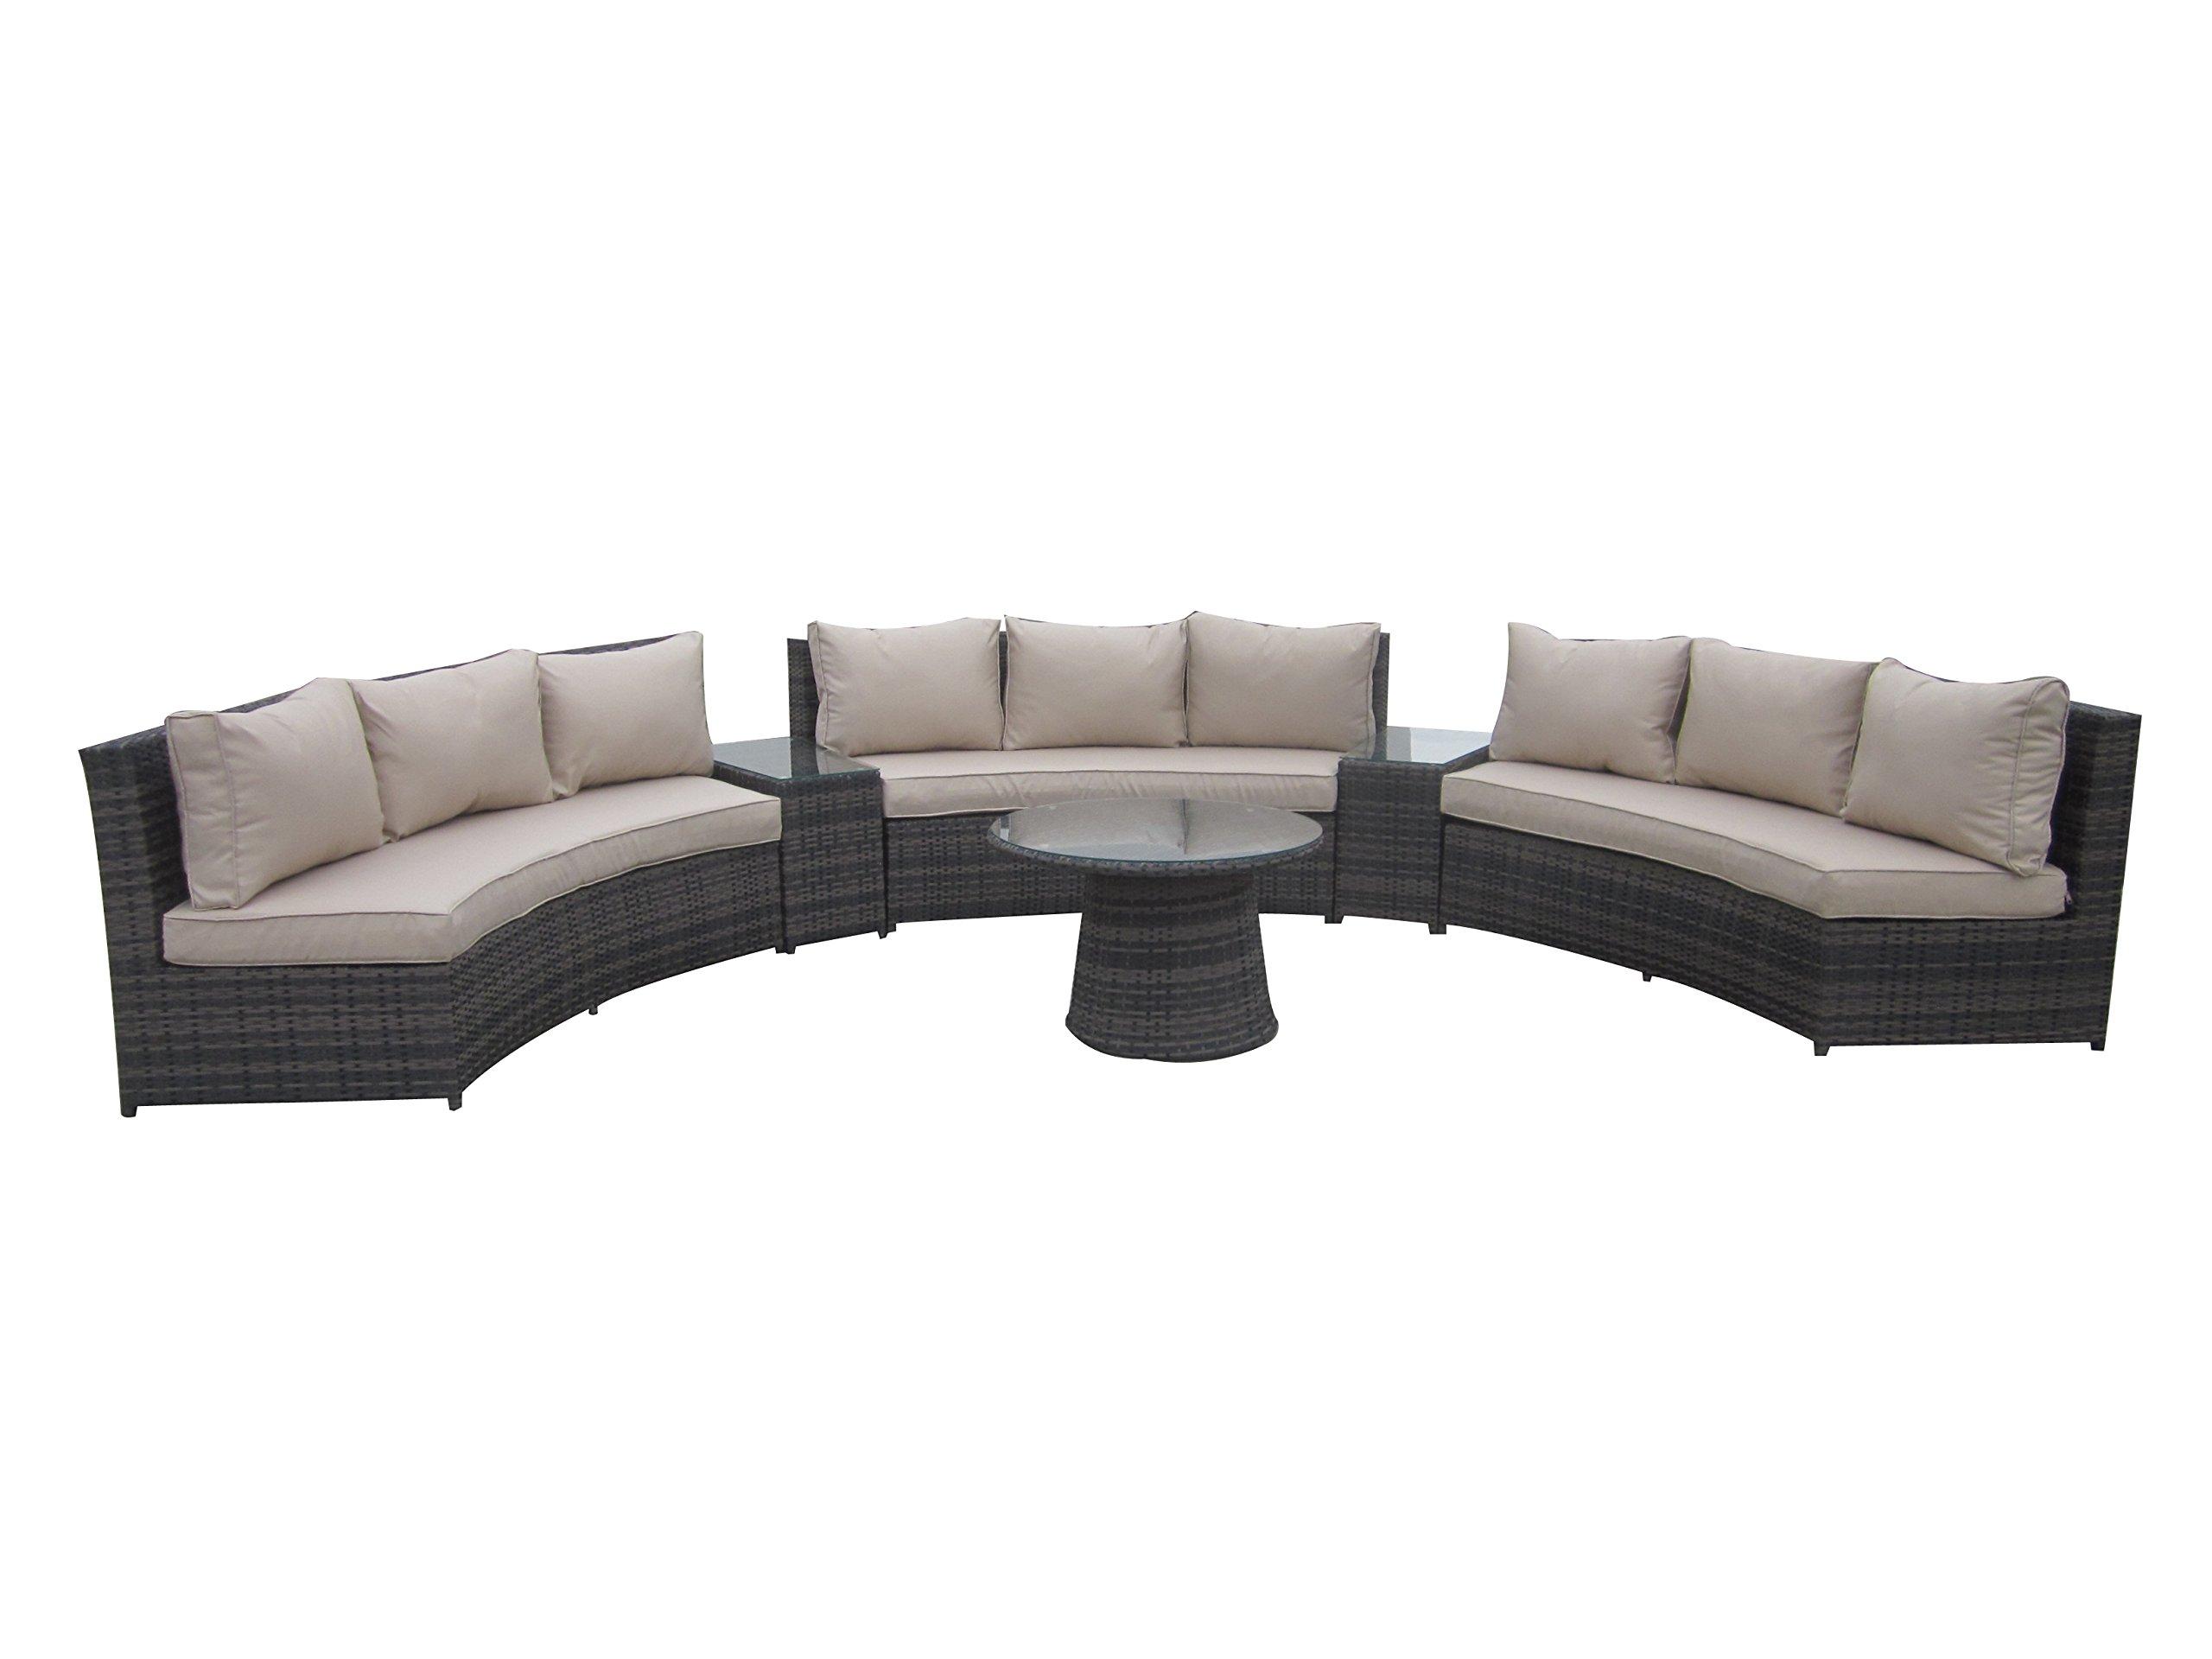 PATIOPTION 6 Piece Conversation Set,Half Moon Rattan Sofa Set - Taupe -  - patio-furniture, patio, conversation-sets - 71B2CTVmfNL -